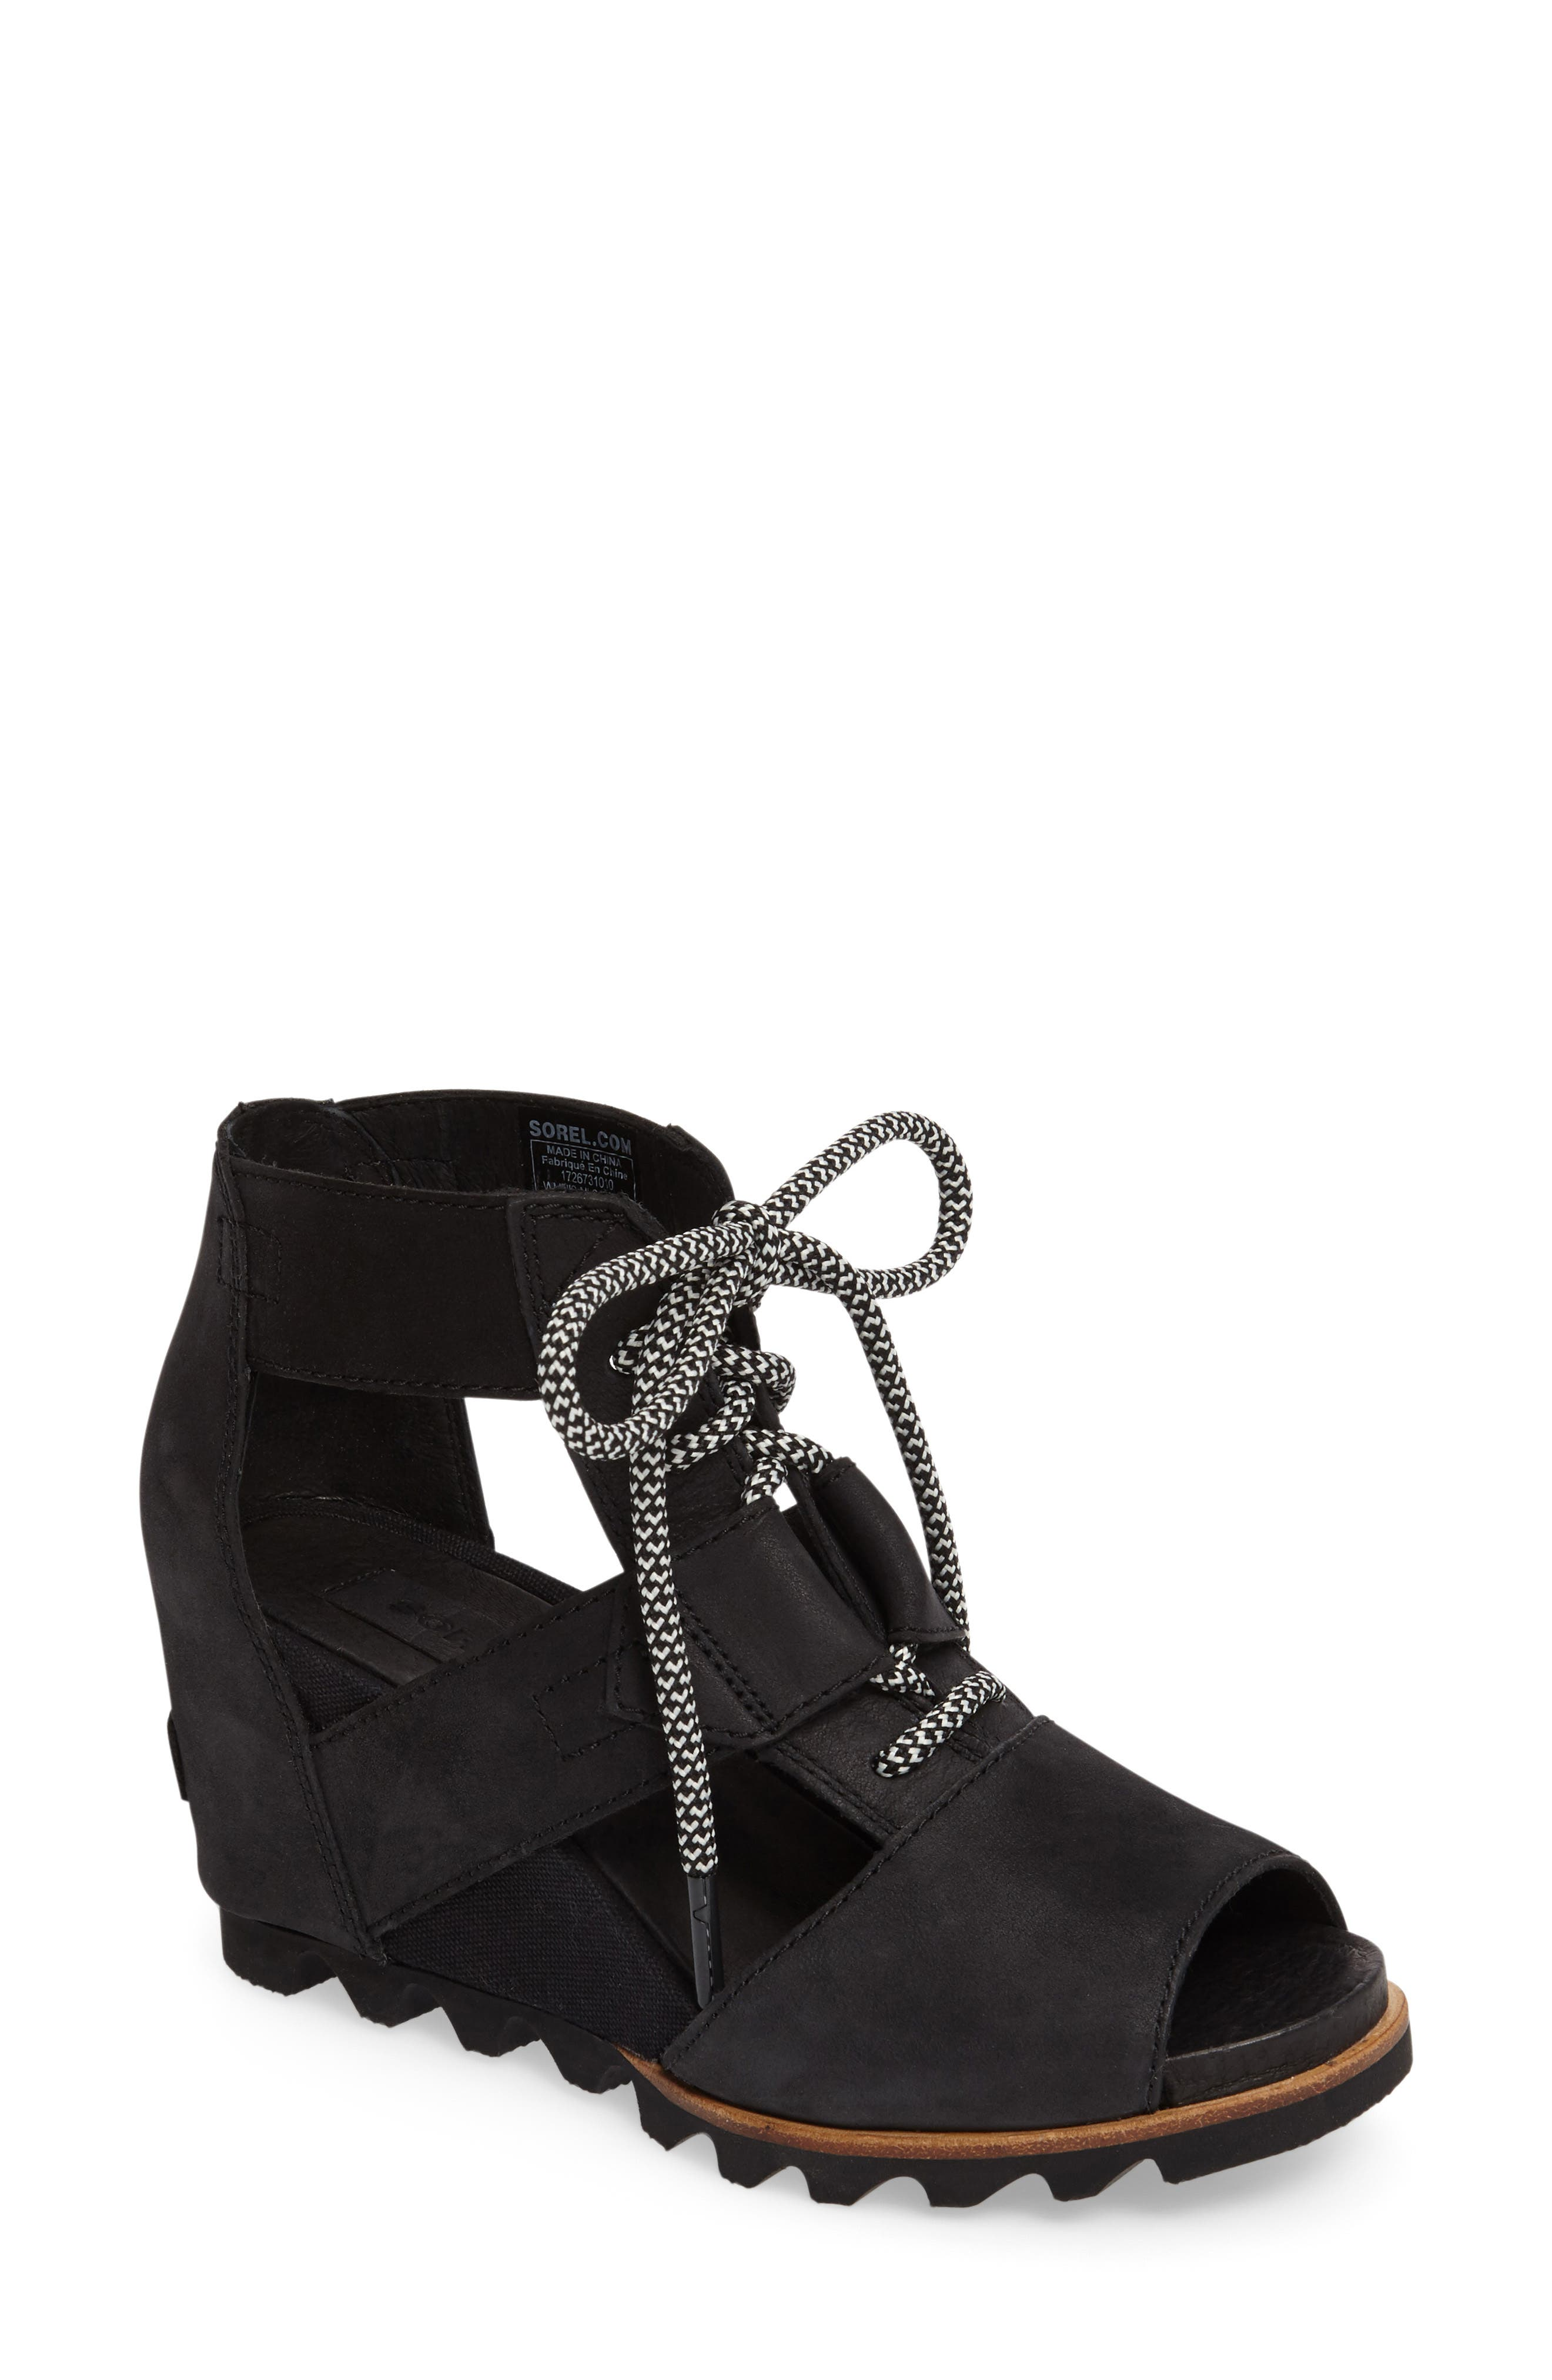 'Joanie' Cage Sandal,                         Main,                         color, BLACK/ SEA SALT